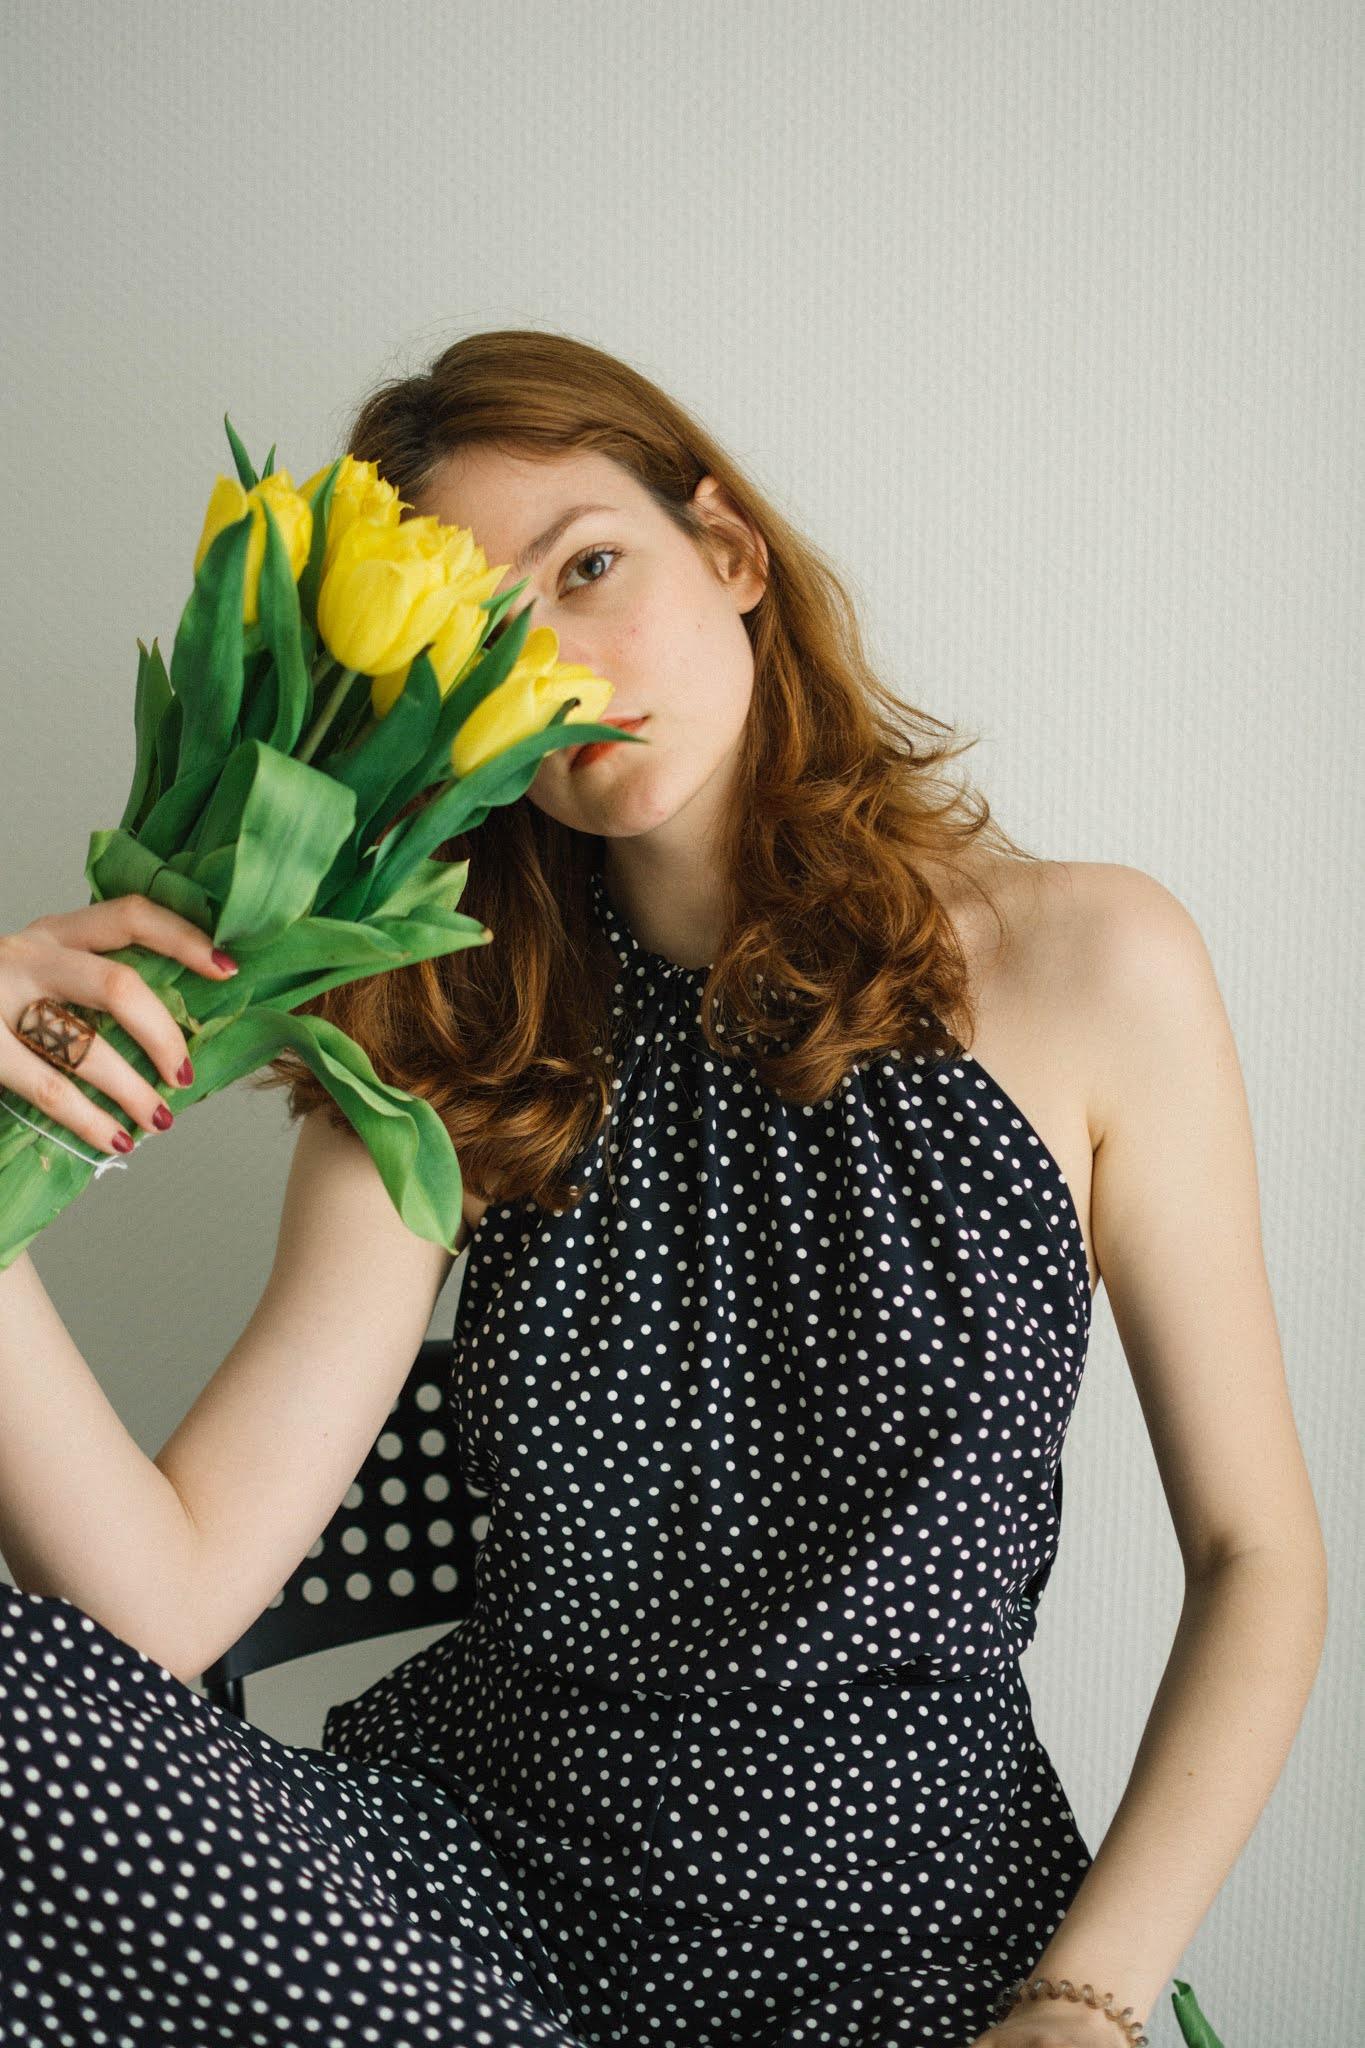 Tea selfportrait with tulips 2